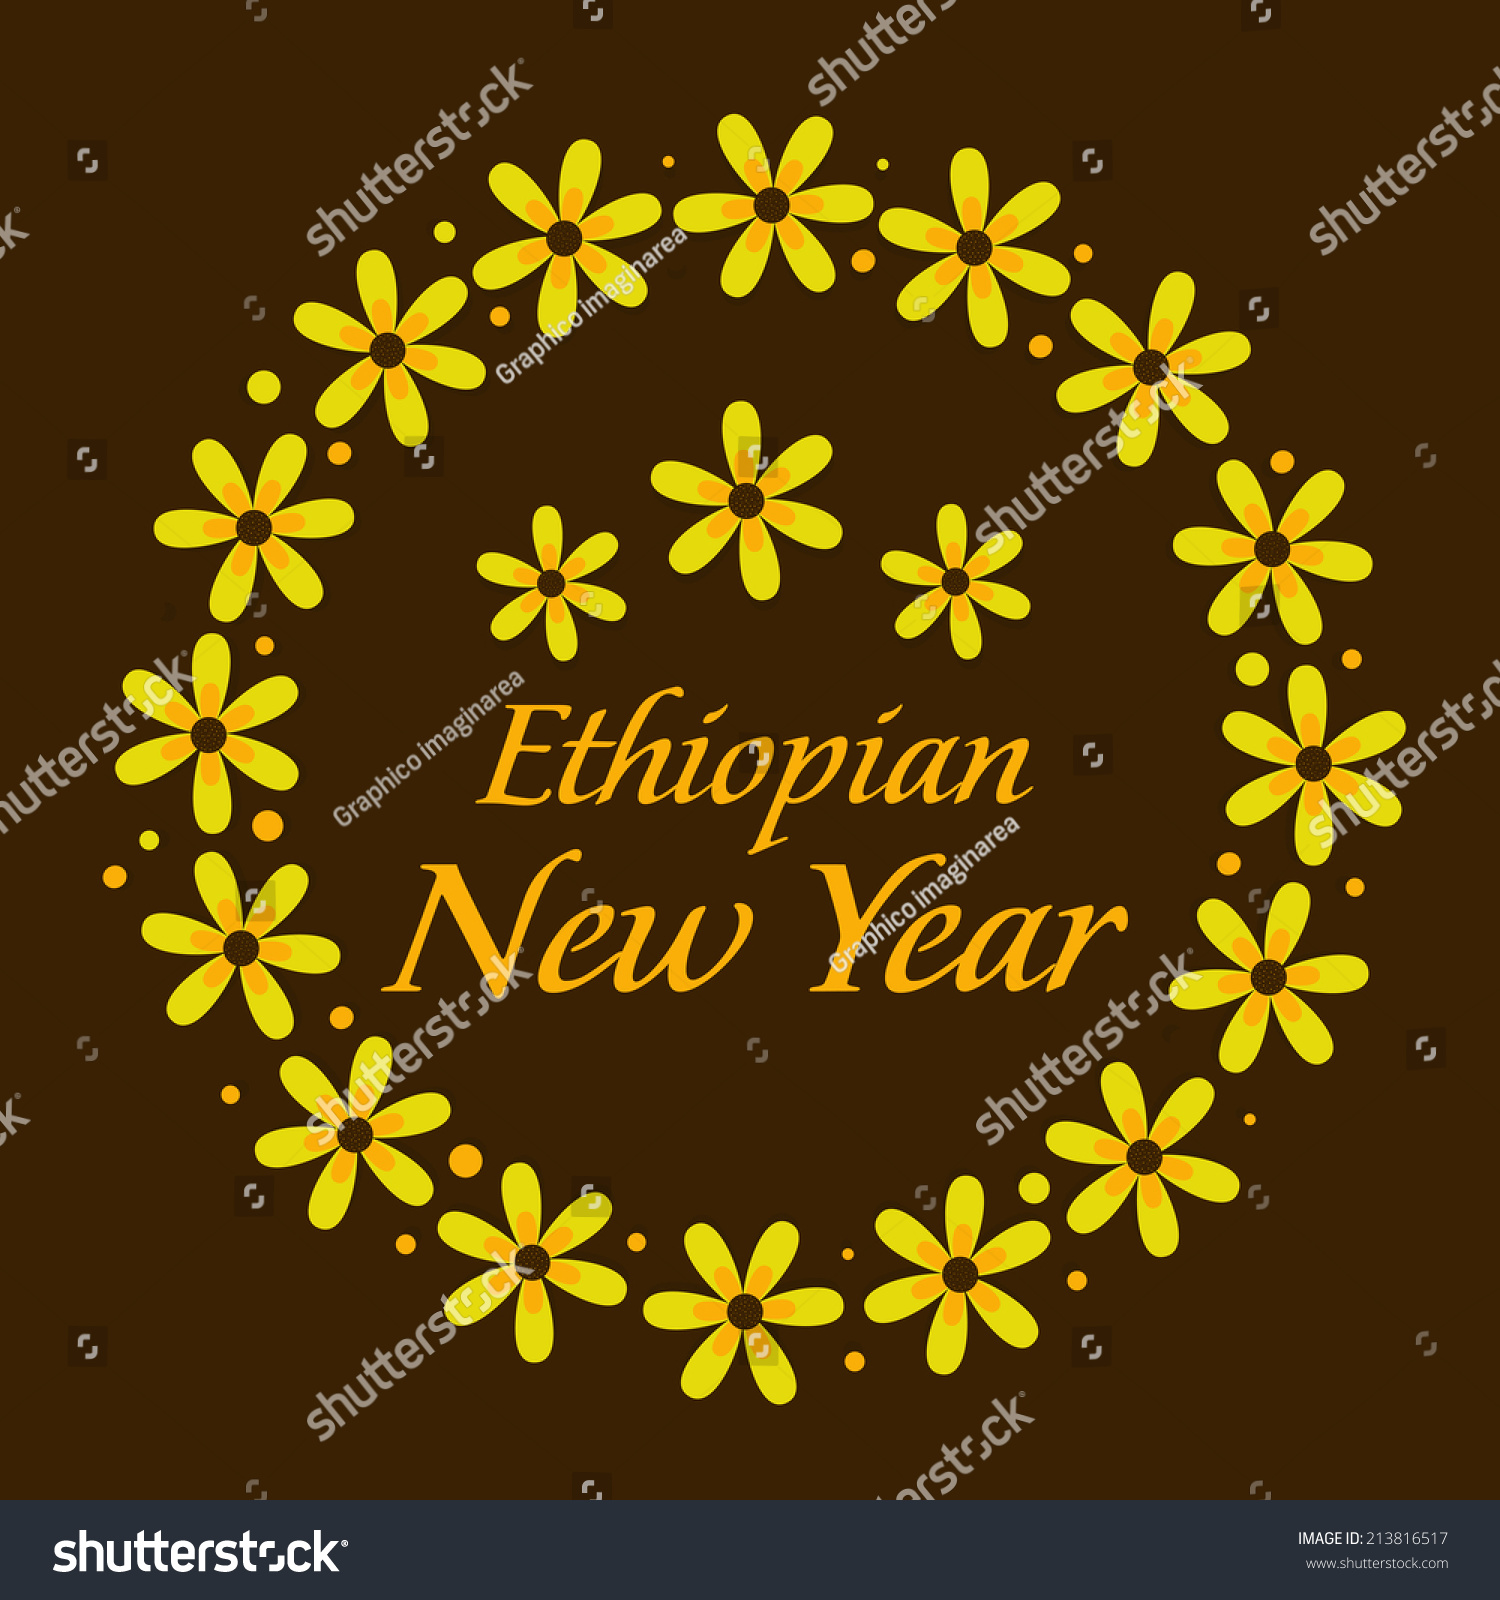 illustration of yellow flower wreaths for ethiopian new year festival